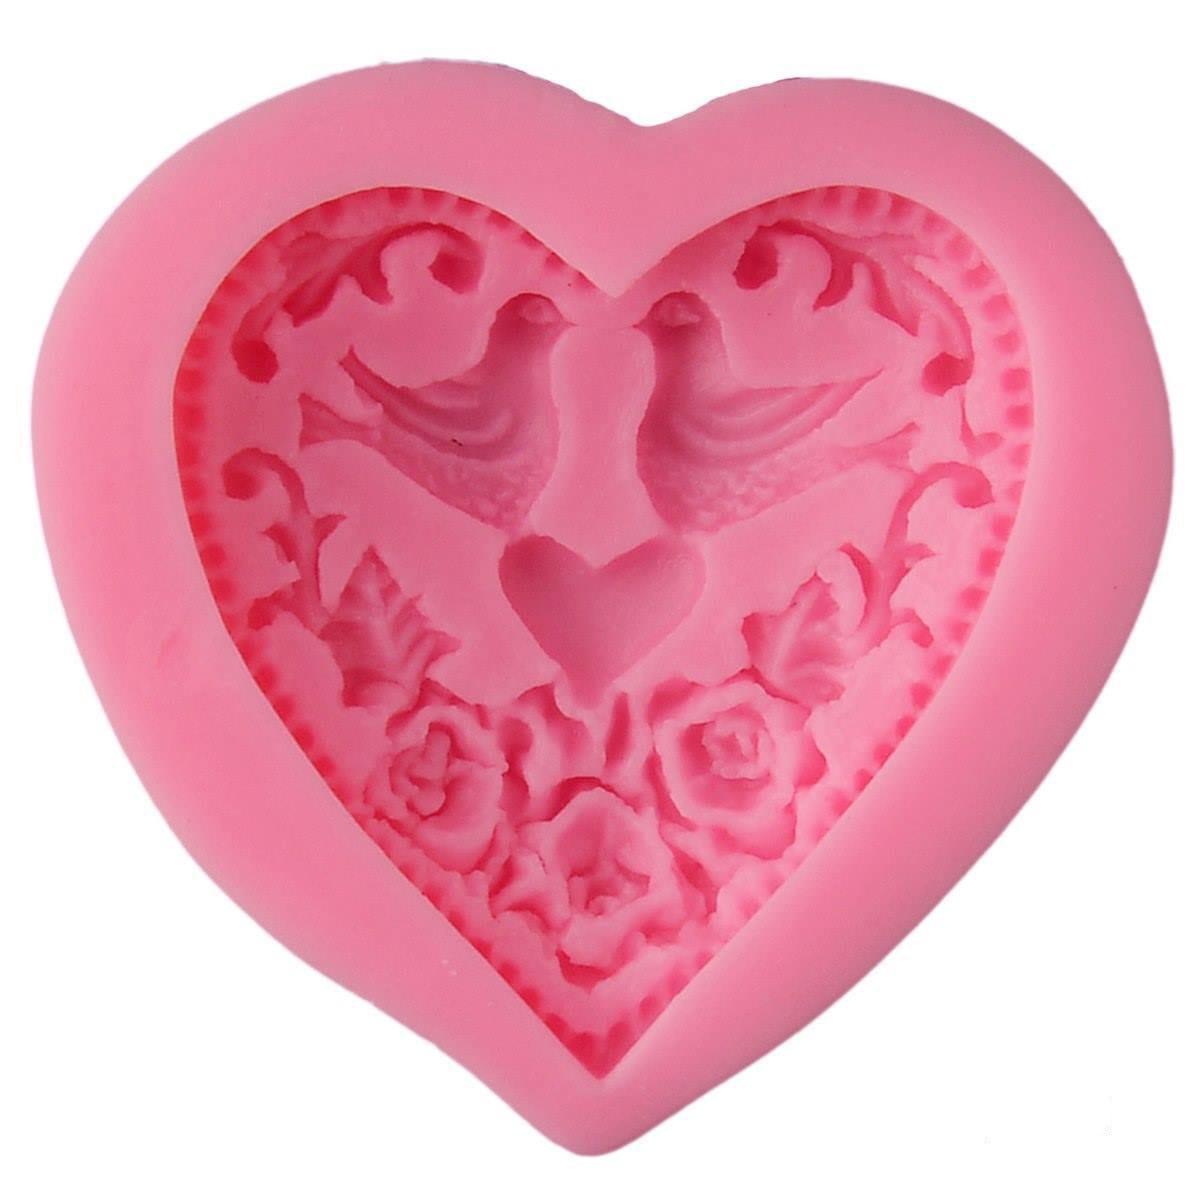 Resin Silicone Mould Bird Heart Design